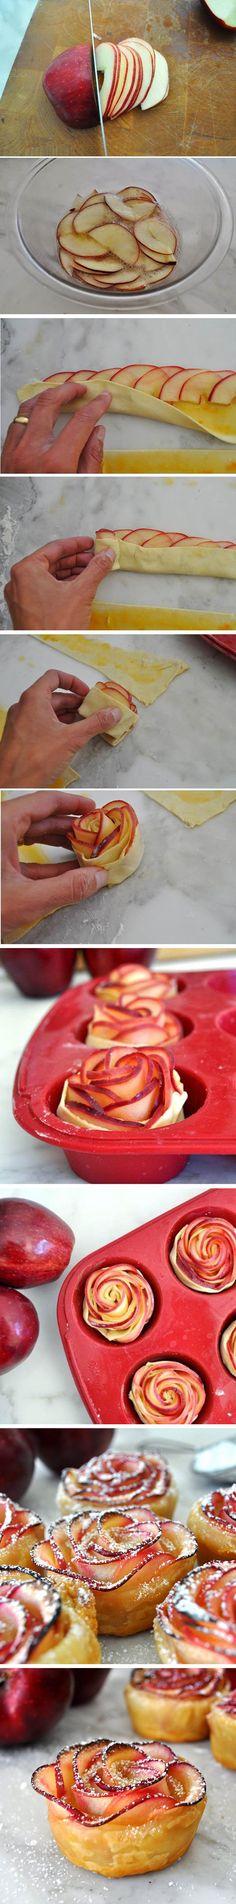 Apfelkuchen mal anderes!